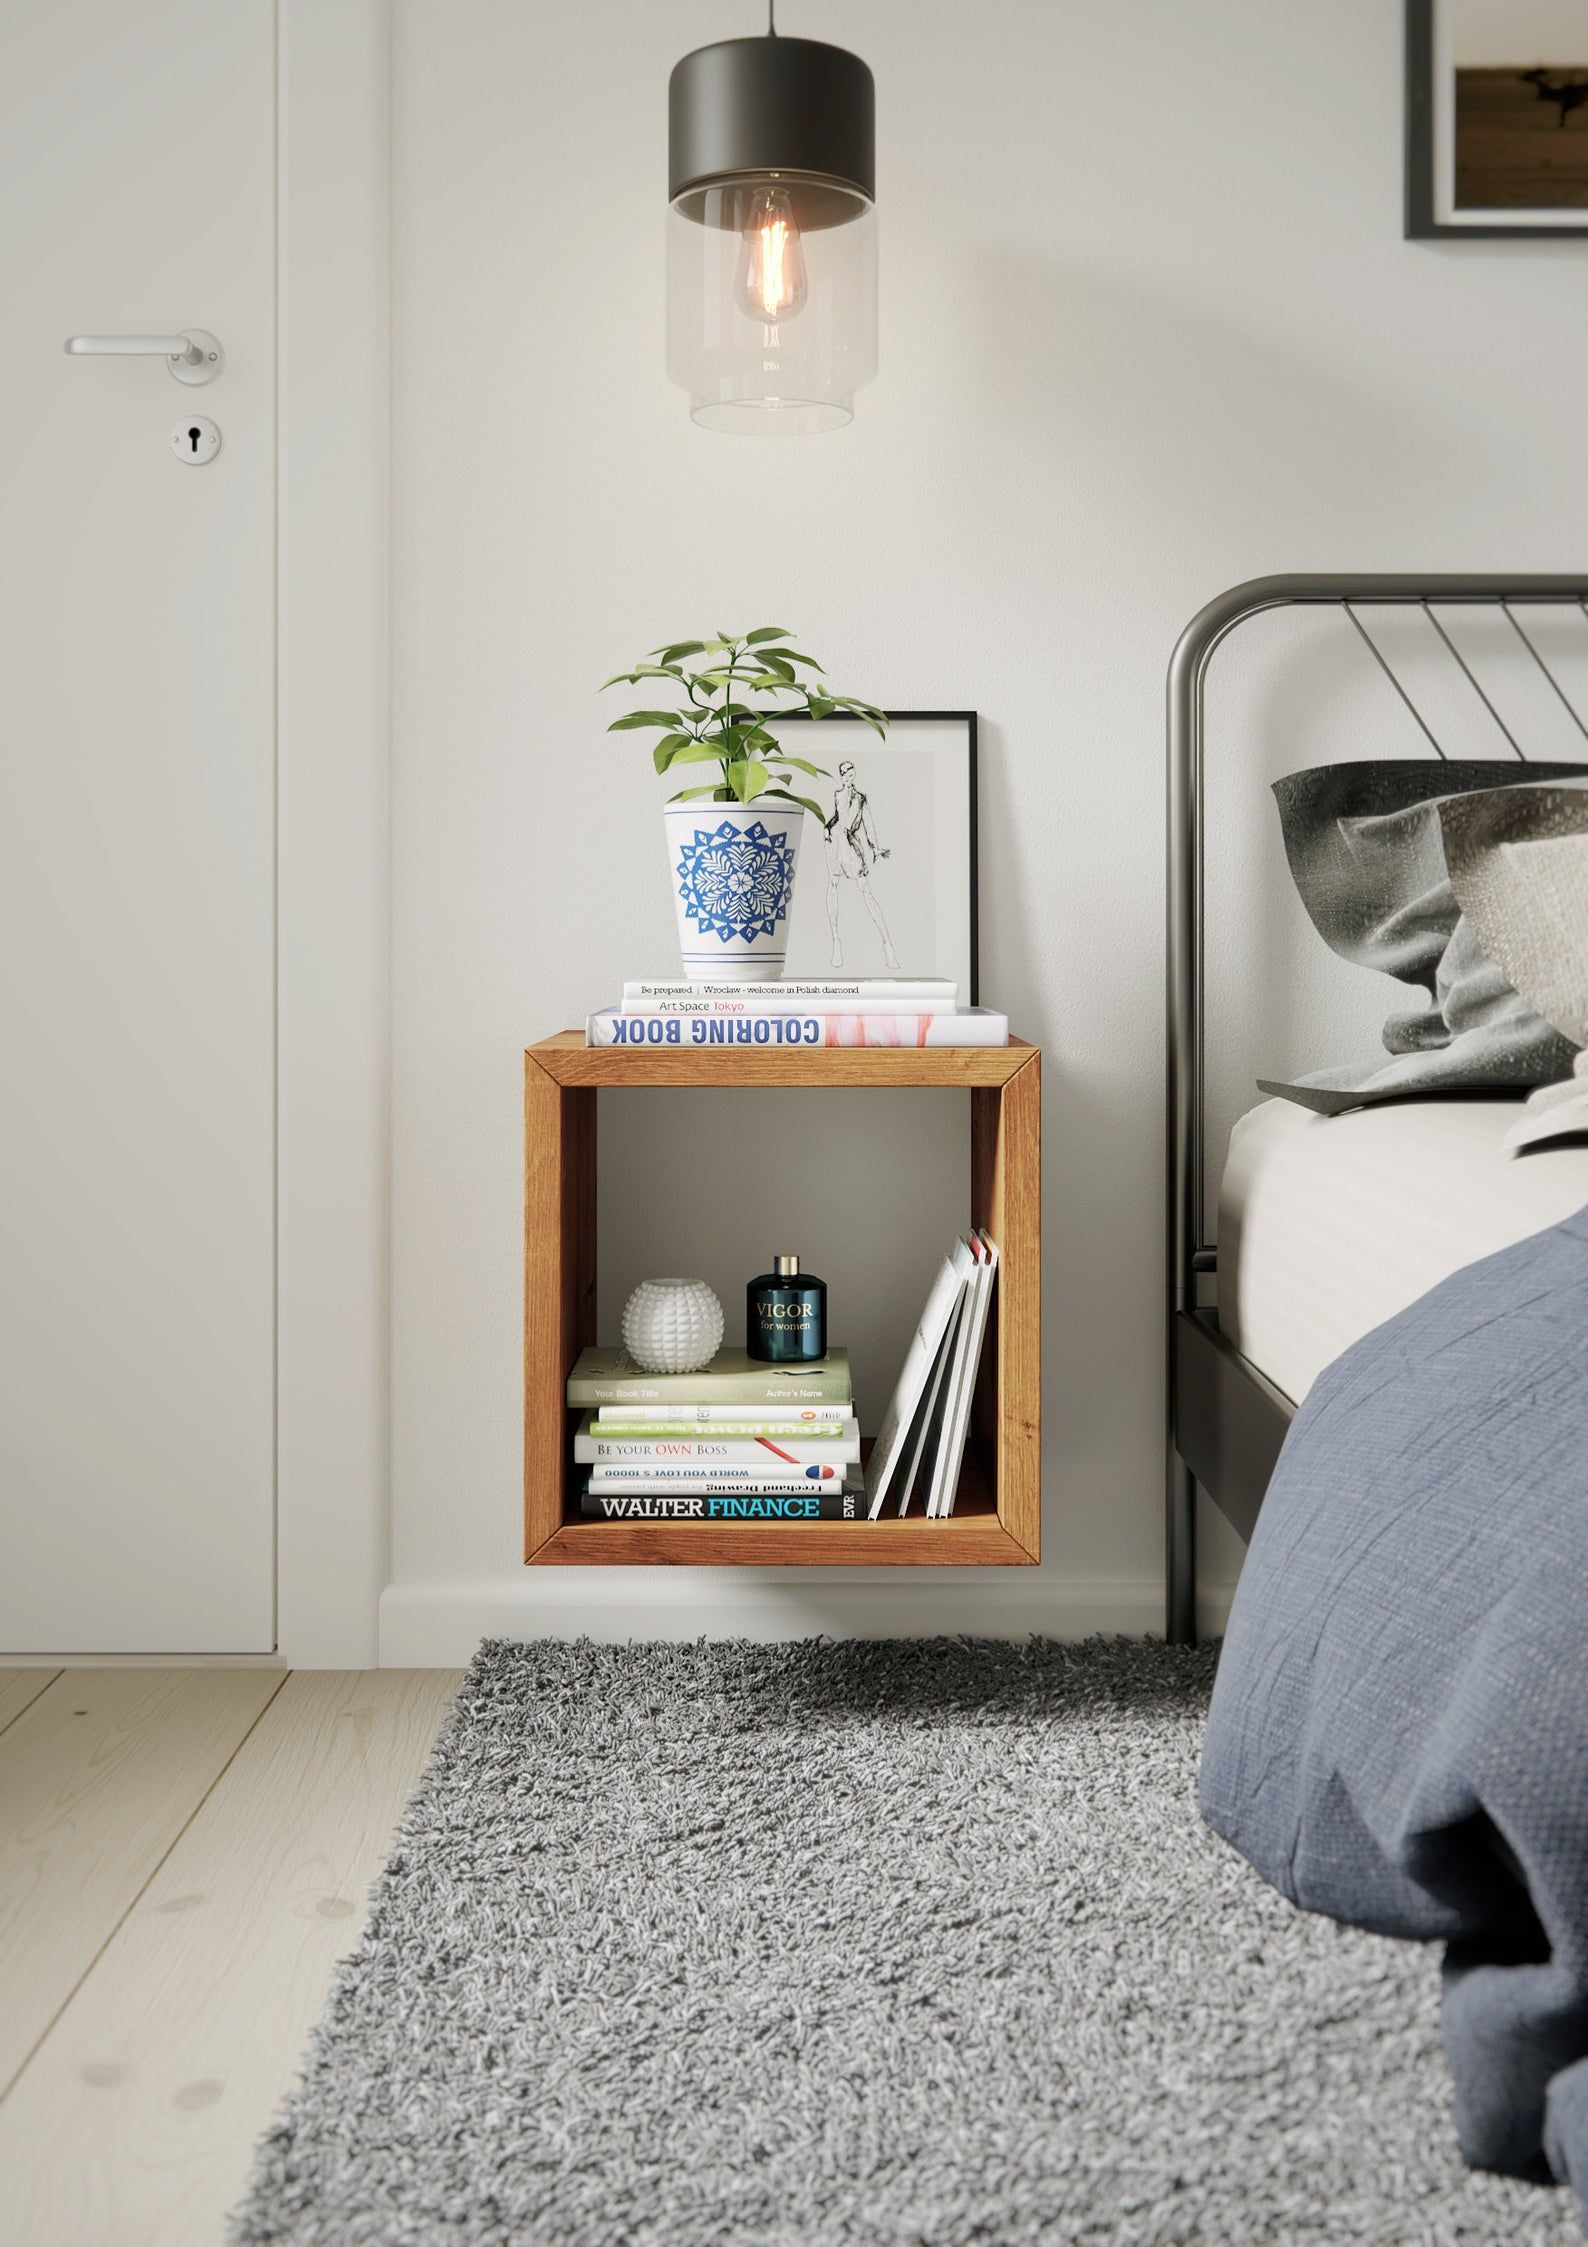 Floating Wall Shelf Box Shelves Solid Oak Bedside Table Etsy Floating Cube Shelves Bedroom Night Stands Wooden Wall Shelves